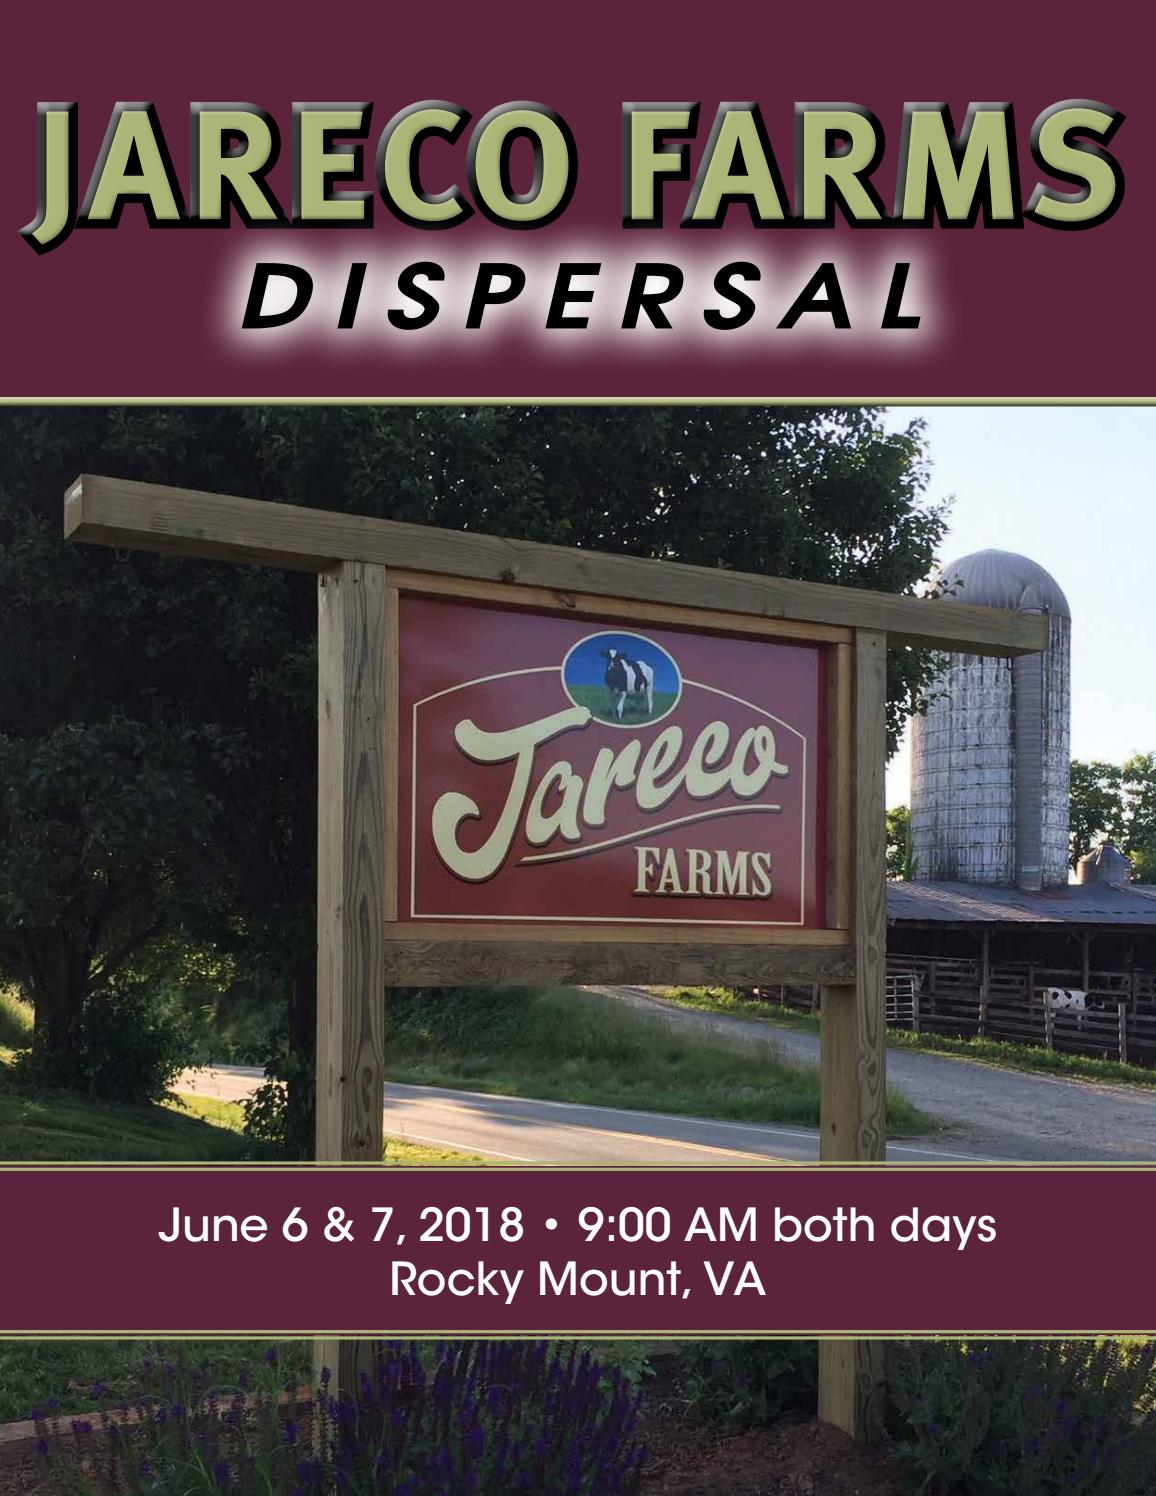 Jareco dispersal 6 6 18 by Dairy Agenda Today - issuu